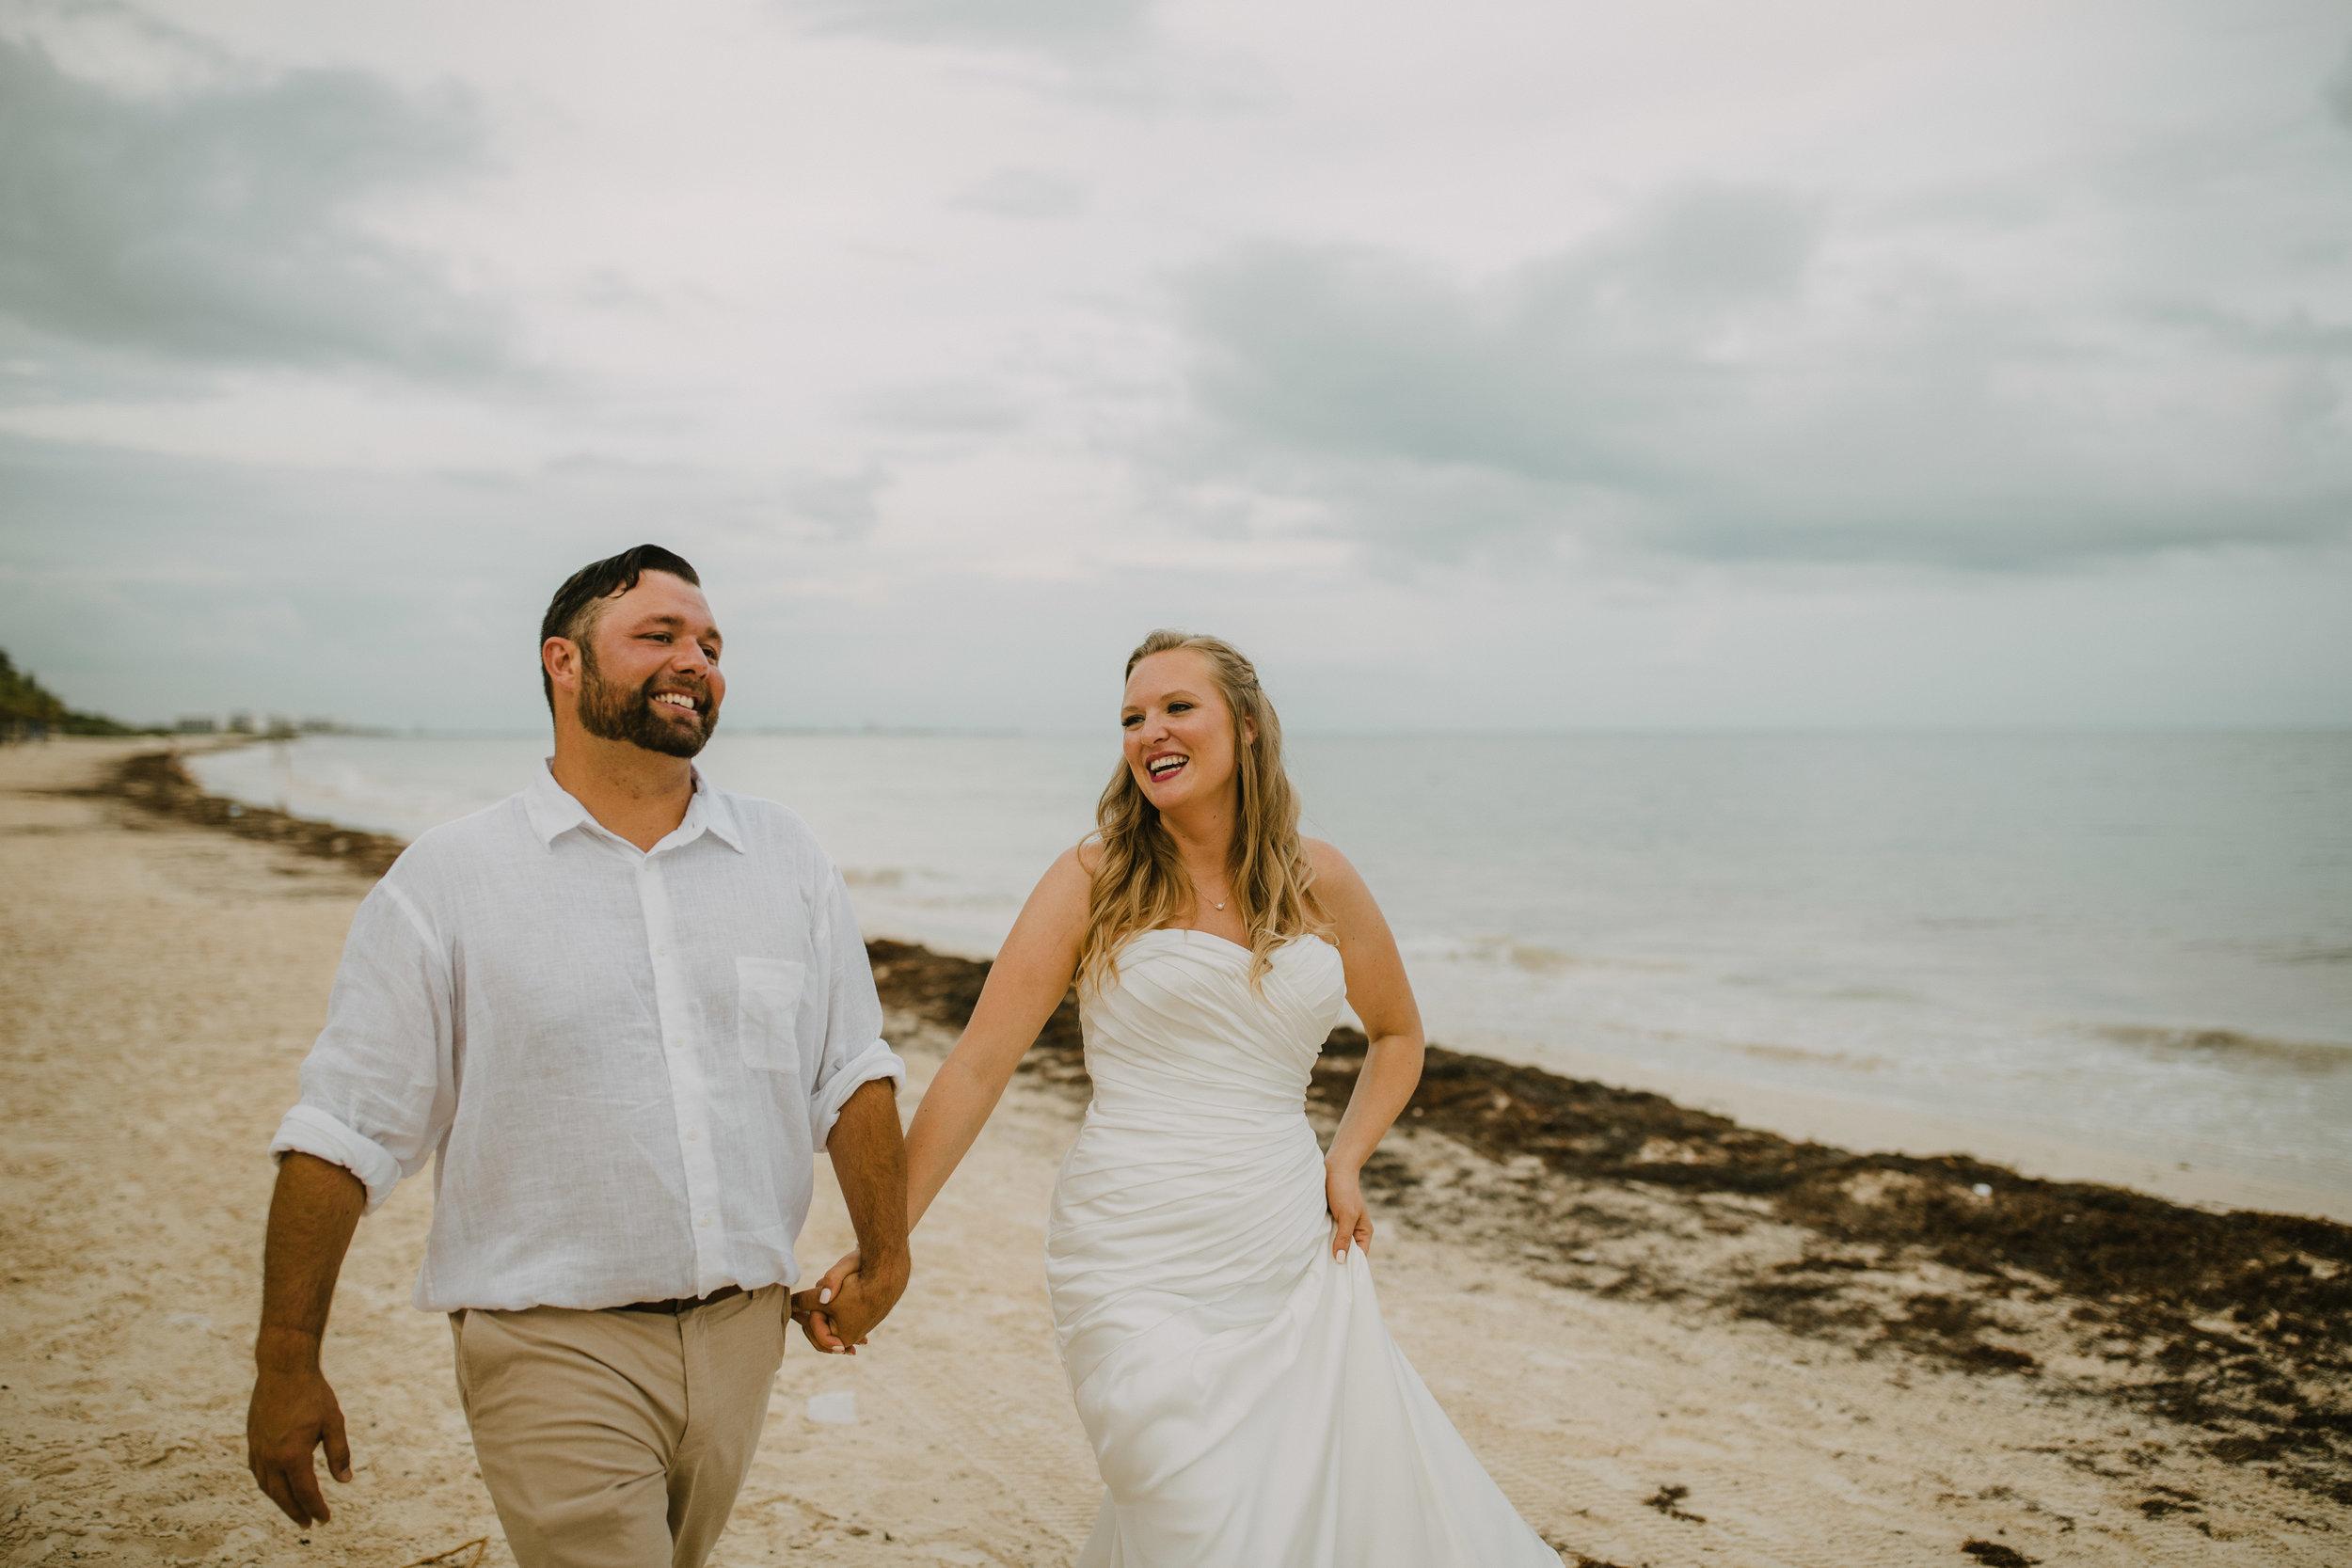 E&N-Destination Wedding Photographer Videographer-465.jpg